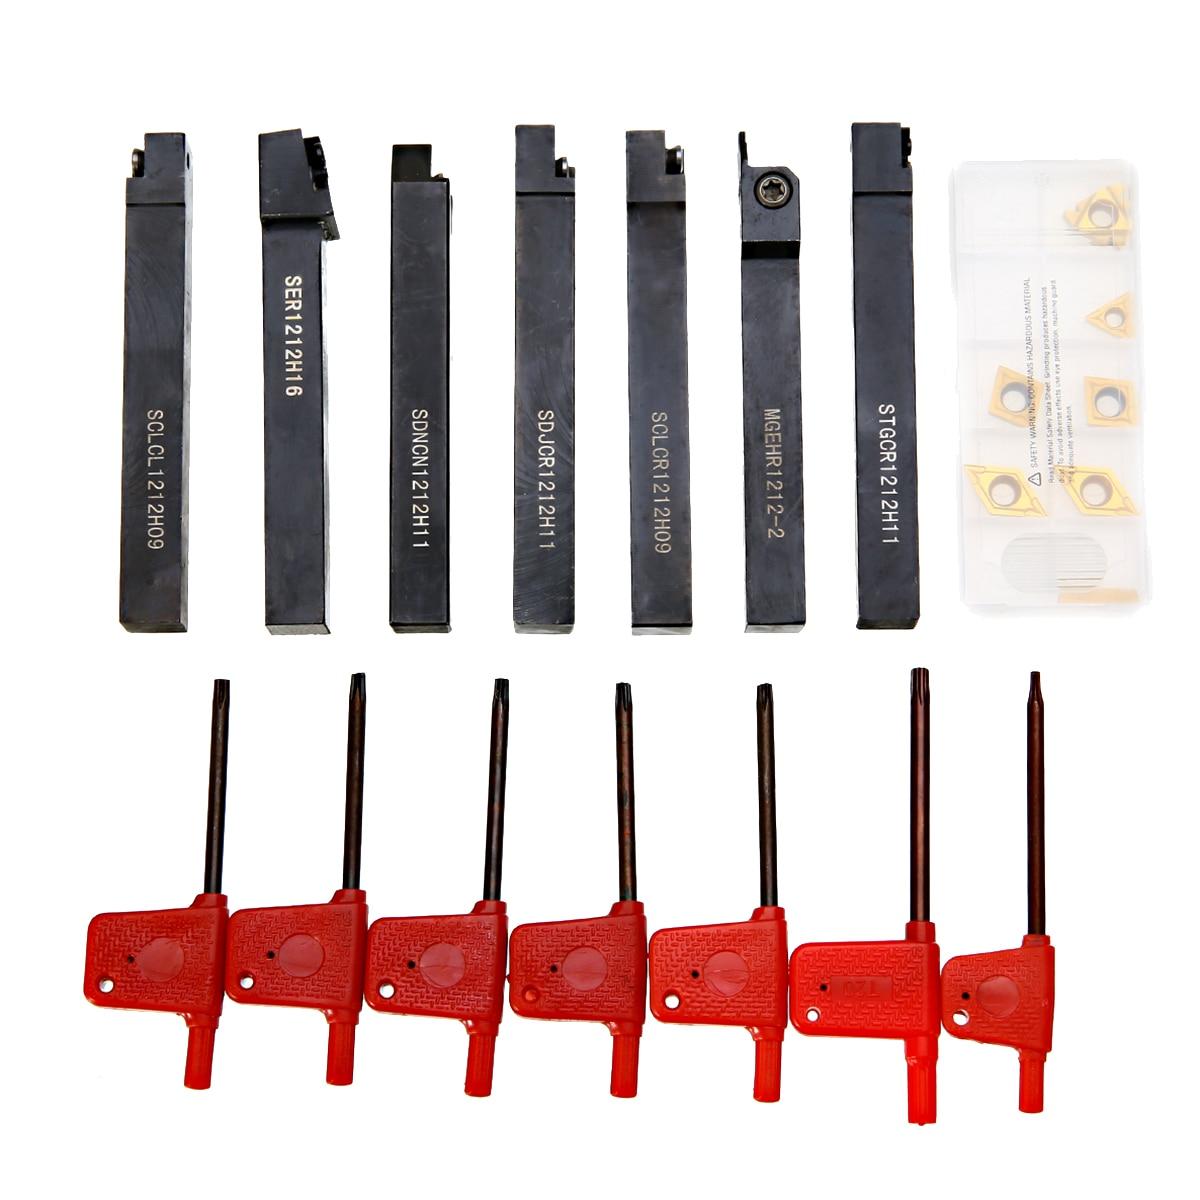 7pcs 100mm Length CNC Lathe Turning Tool Holder + 7pcs DCMT TCMT CCMT Inserts with 7pcs Wrenches7pcs 100mm Length CNC Lathe Turning Tool Holder + 7pcs DCMT TCMT CCMT Inserts with 7pcs Wrenches